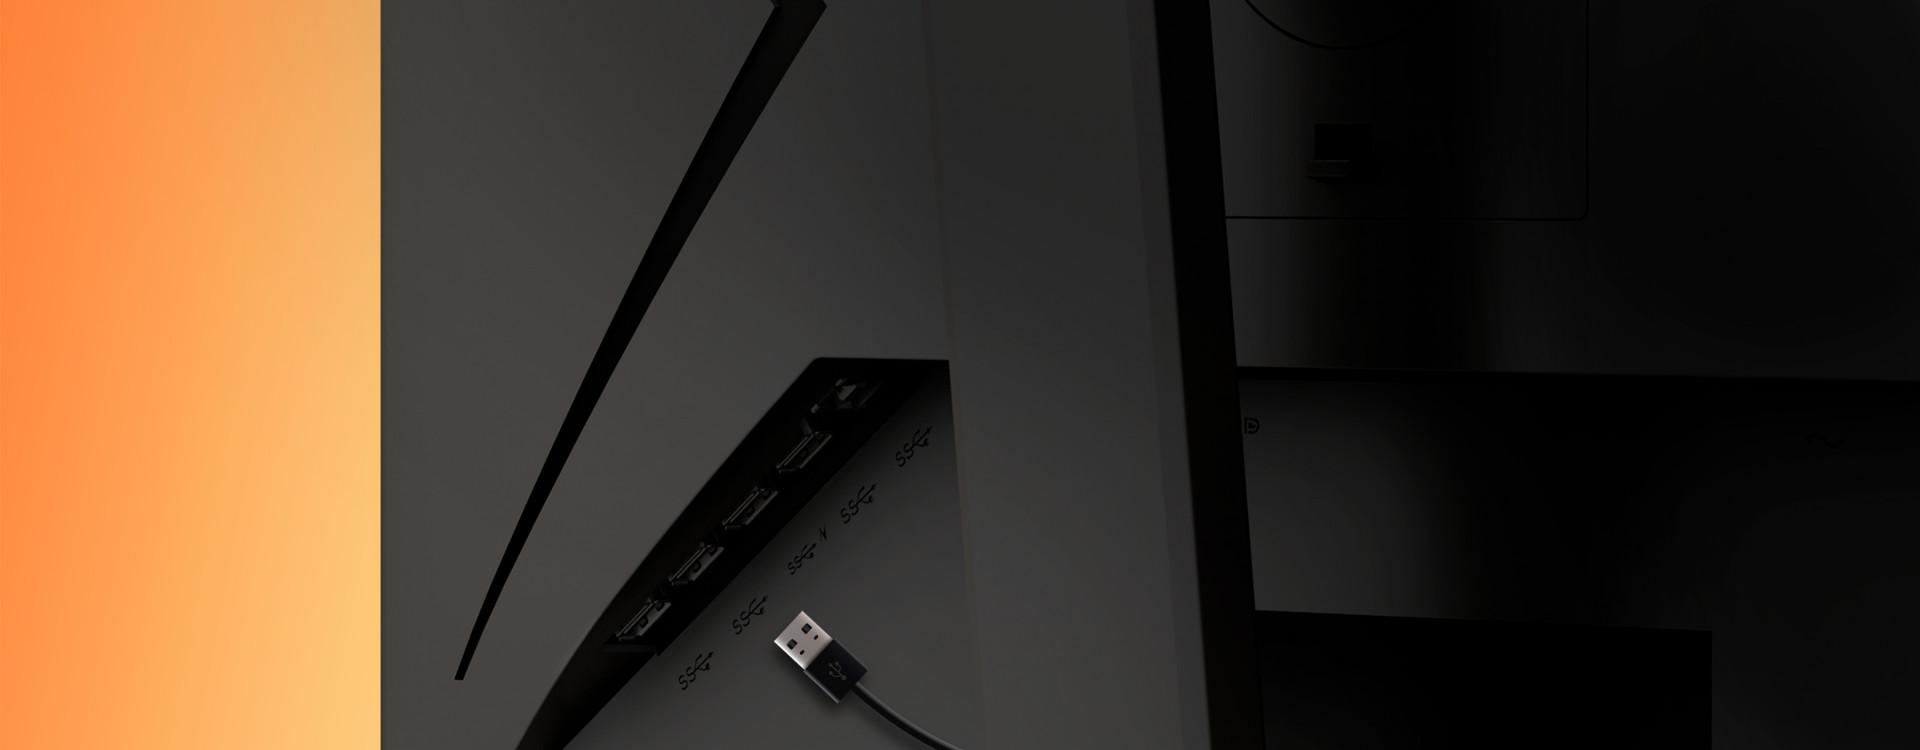 AOC_B2B_C_U28P2_USB_HUB_.jpg